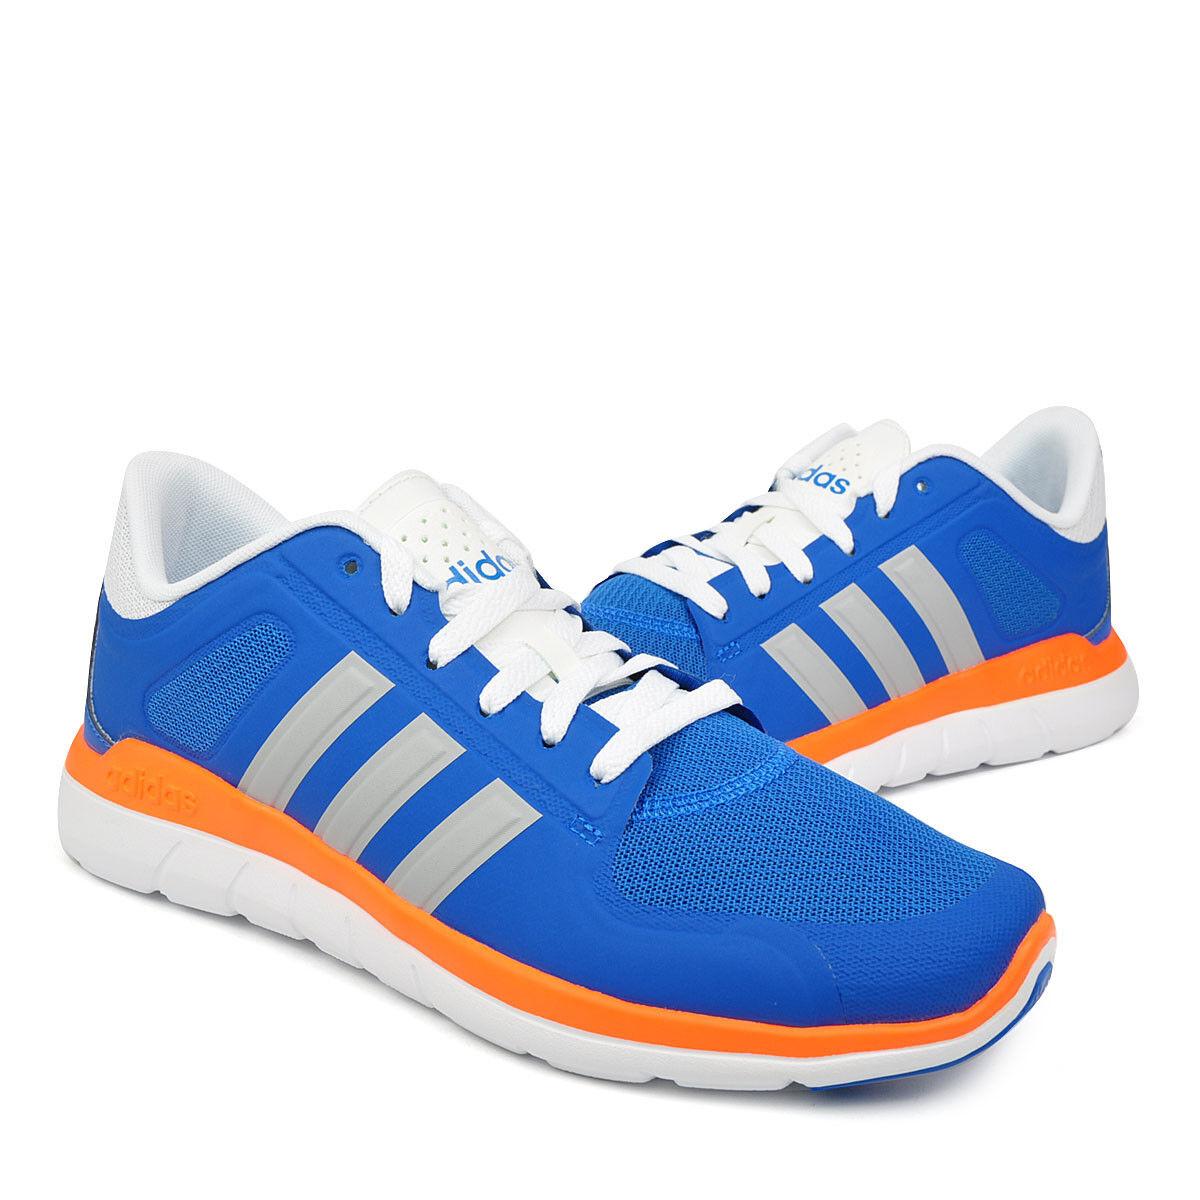 Adidas X Lite TM Turnchaussures NEUF bleu gr 47 1 3 Quotidien Sport chaussures f99311 Neo Samba